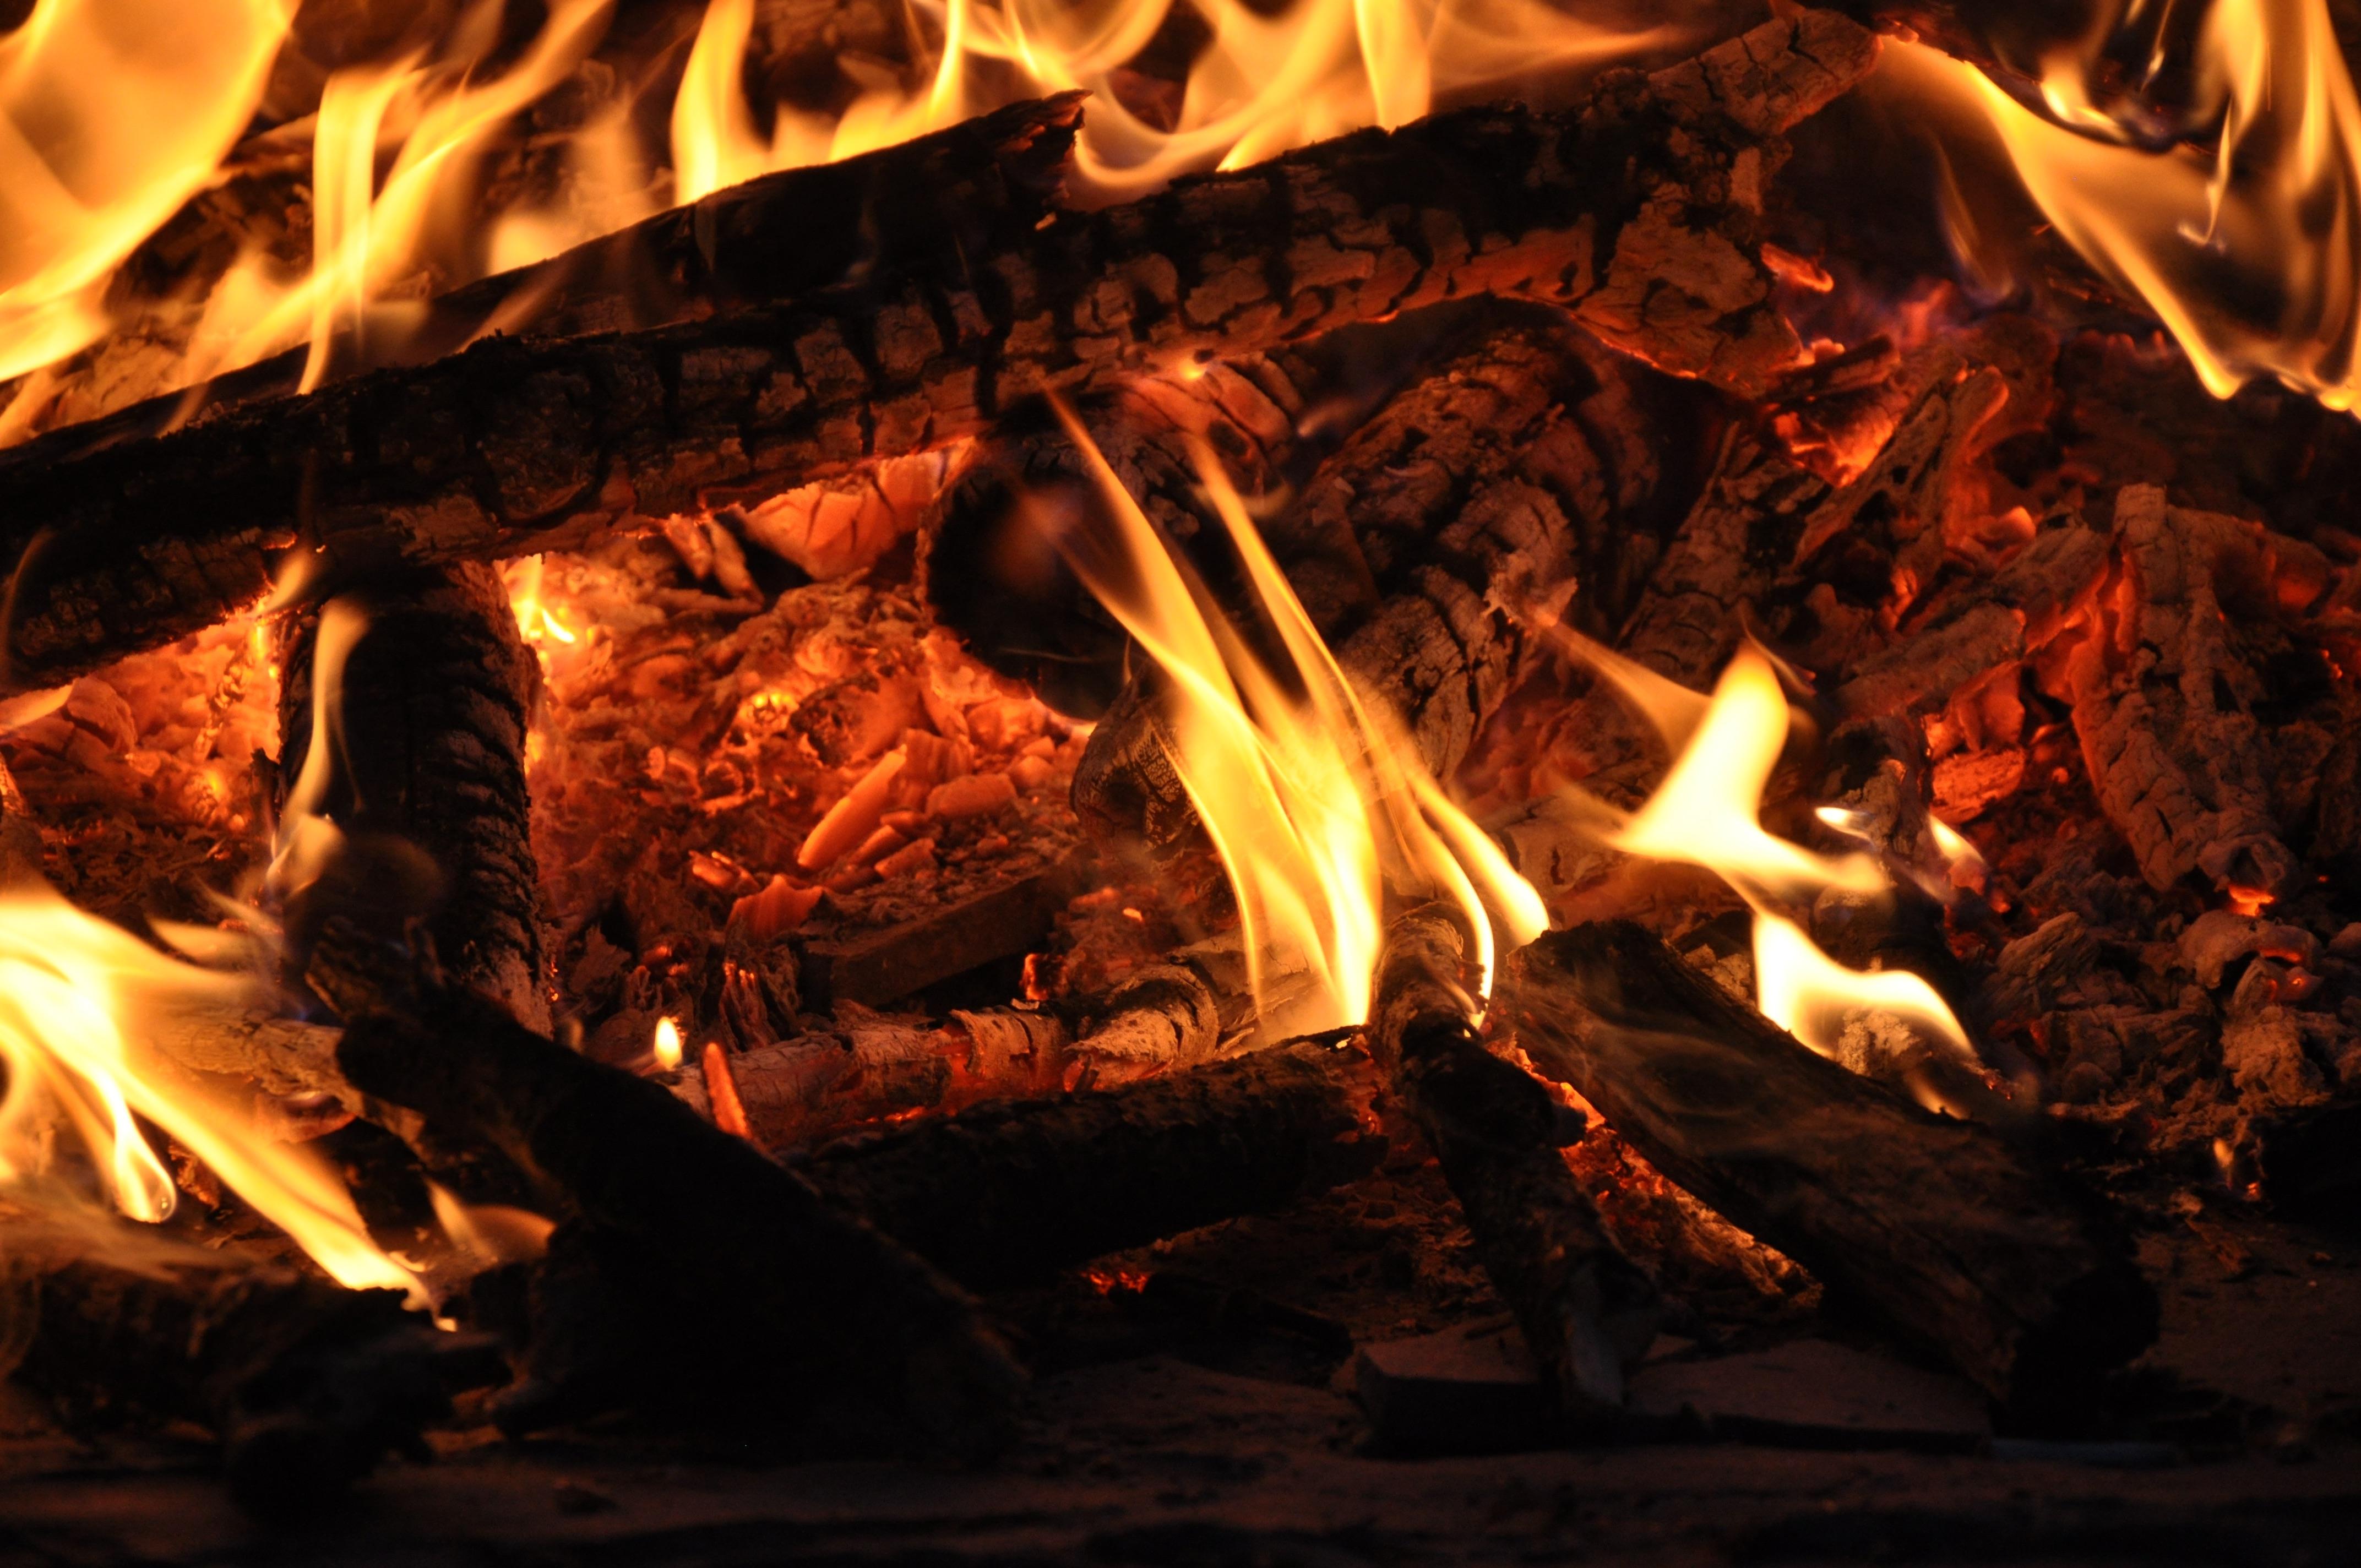 рецепт много огня картинки без претензии